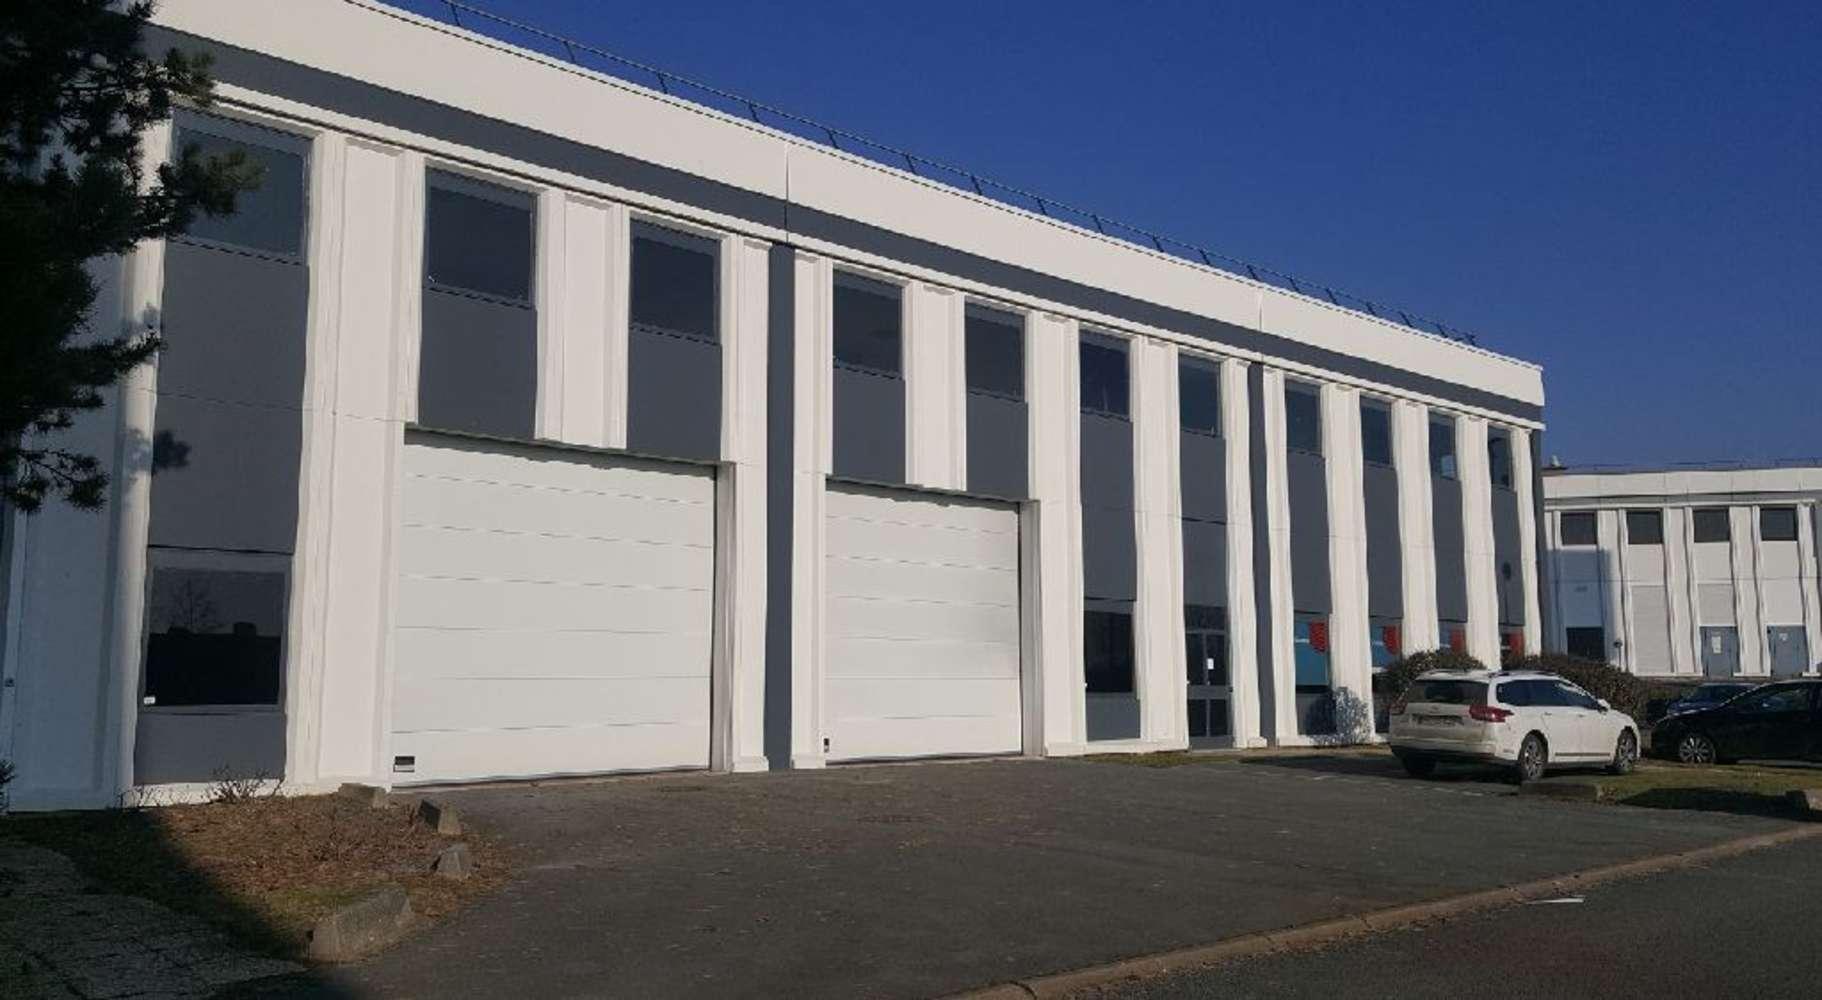 Activités/entrepôt Villebon sur yvette, 91140 - GOYAVE - 9520895